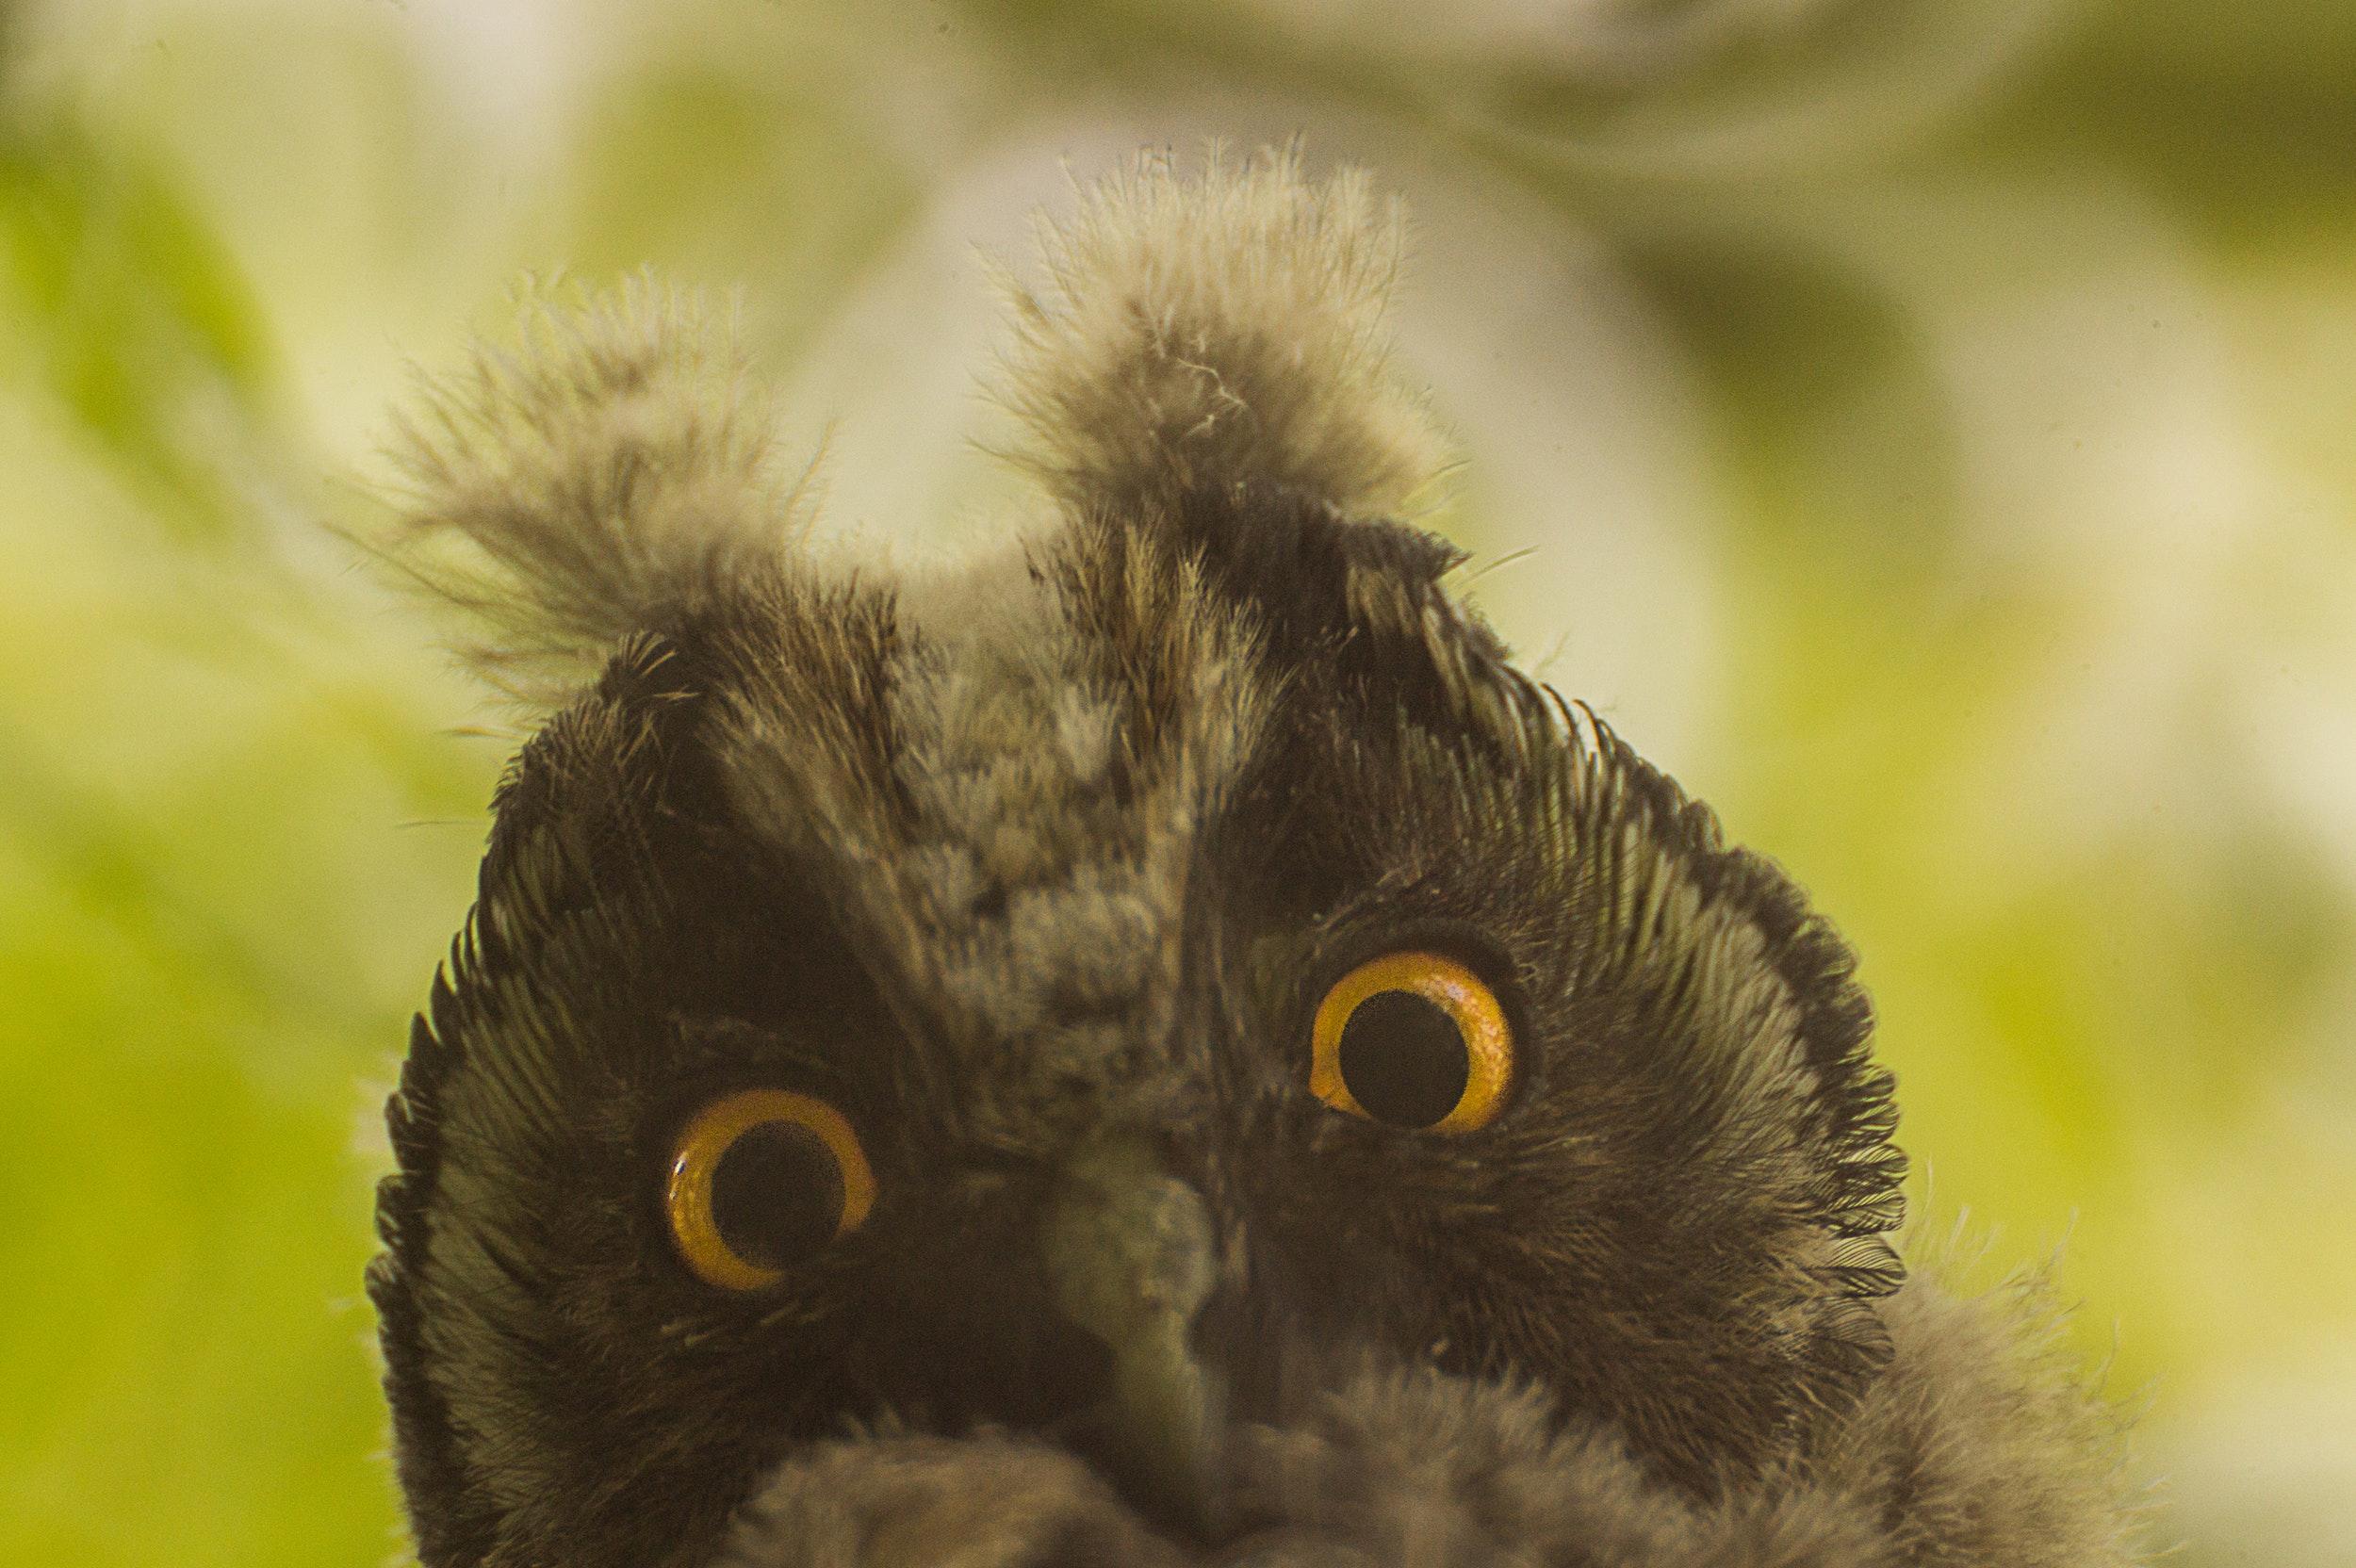 animals-birds-owl-fauna (1).jpg